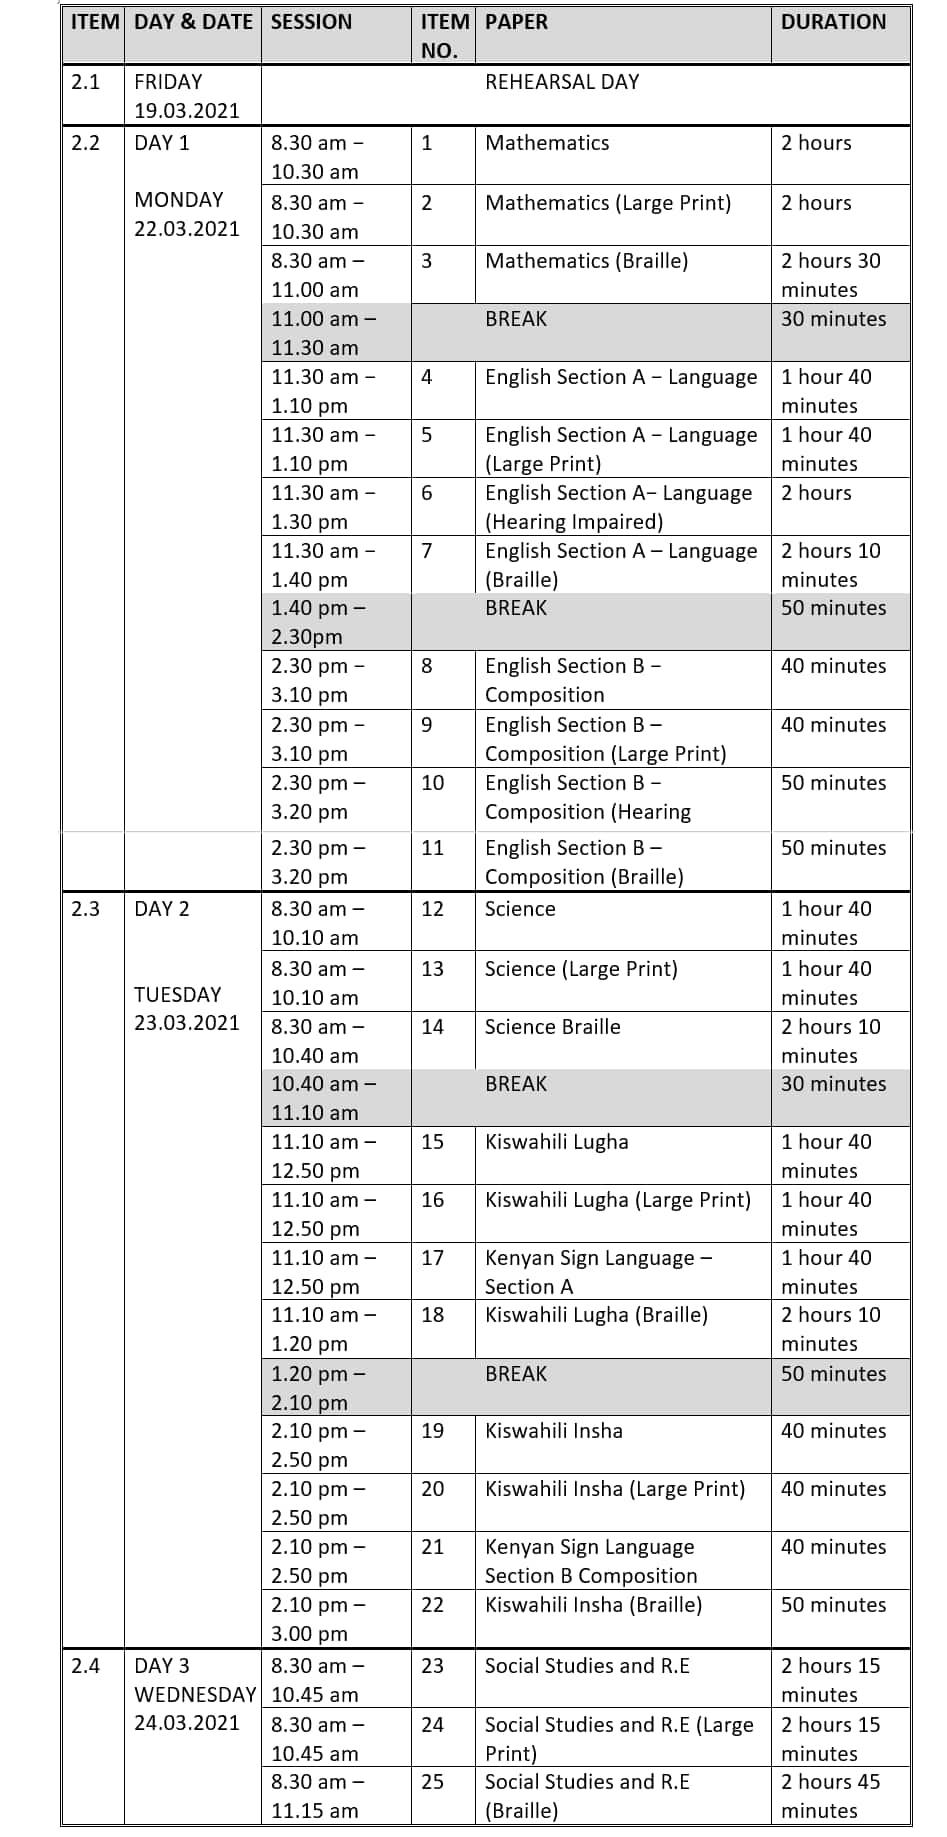 KCPE examination timetable